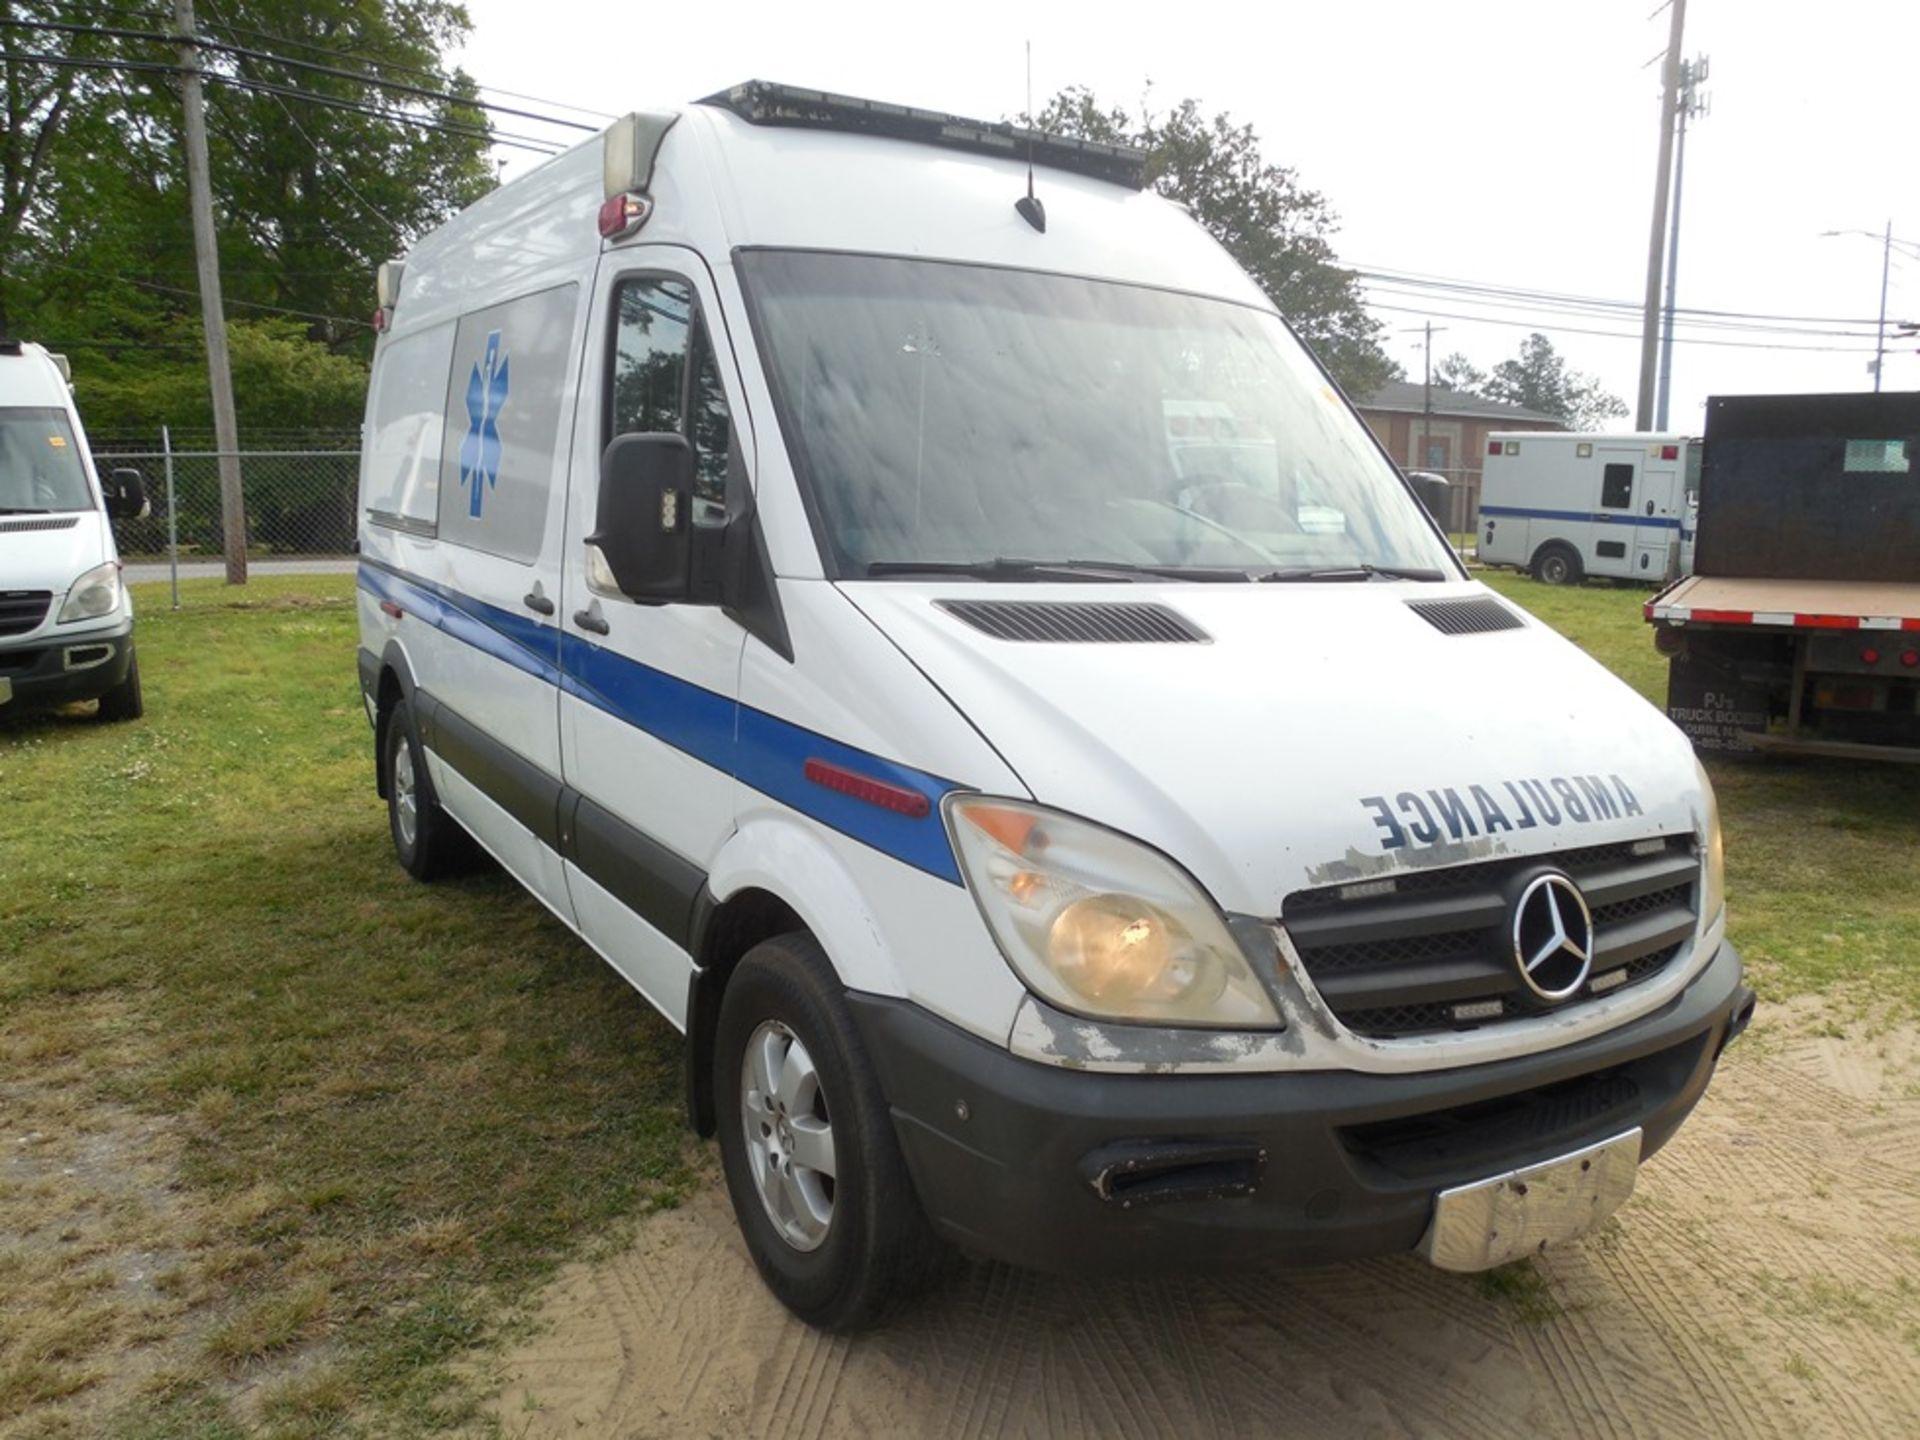 2010 Mercedes Sprinter dsl, ambulance 329,856 miles vin# WD3PE7CCXA5476270 - Image 3 of 6